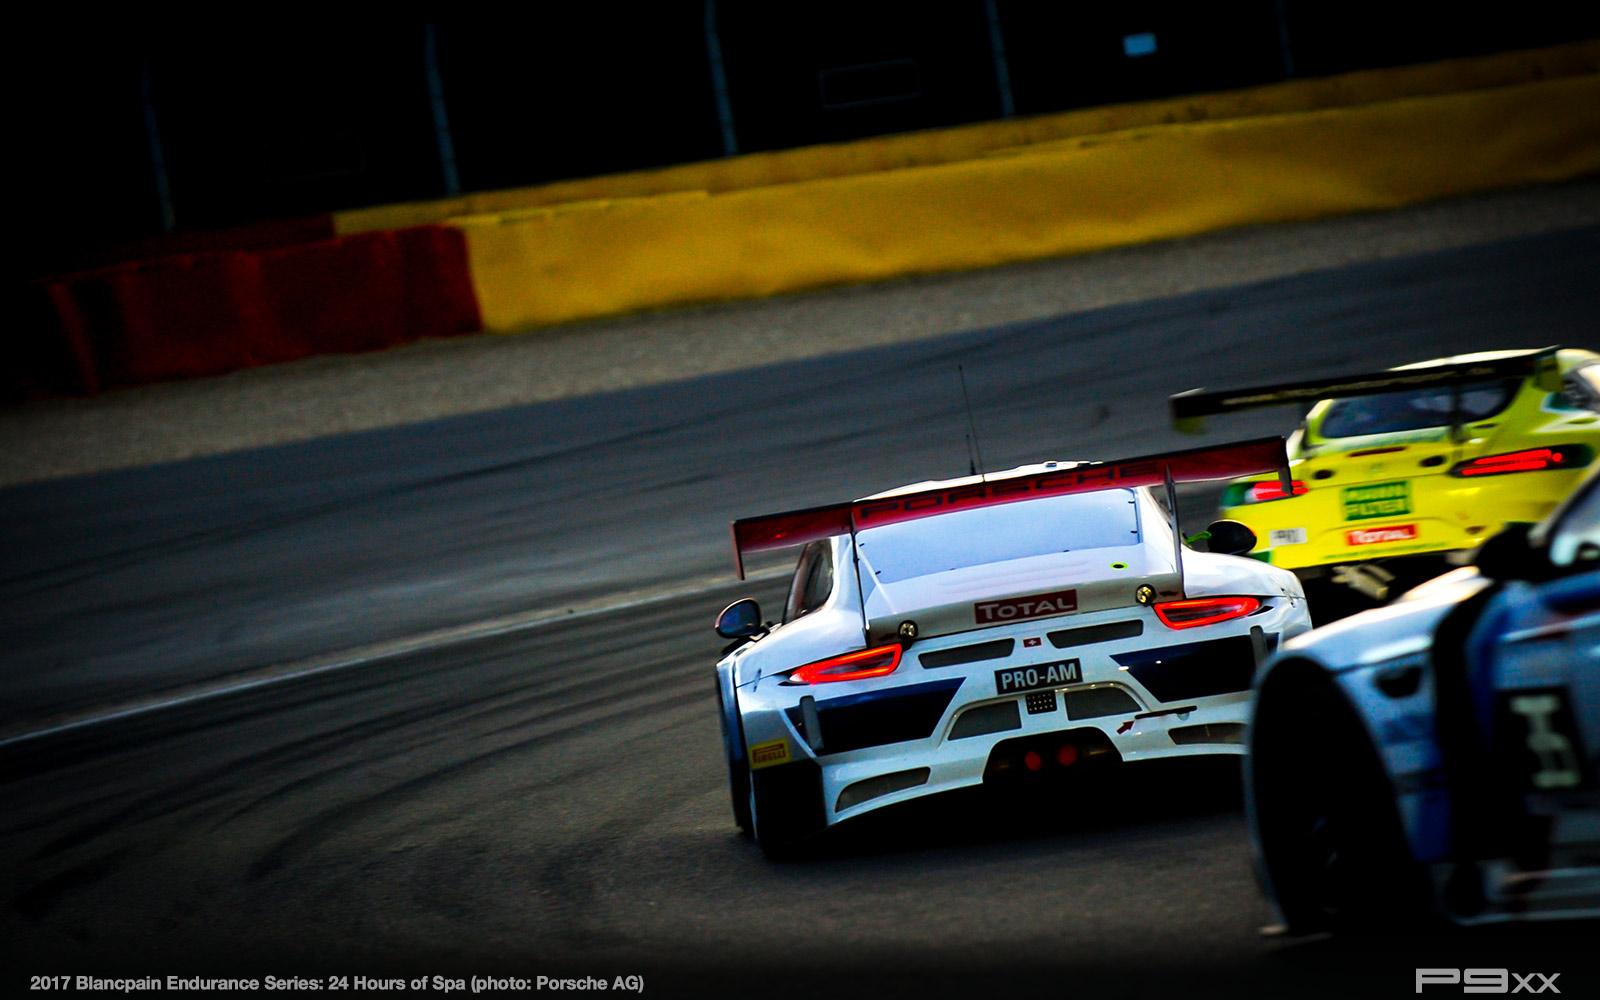 2017-24-Hours-of-Spa-Porsche-359